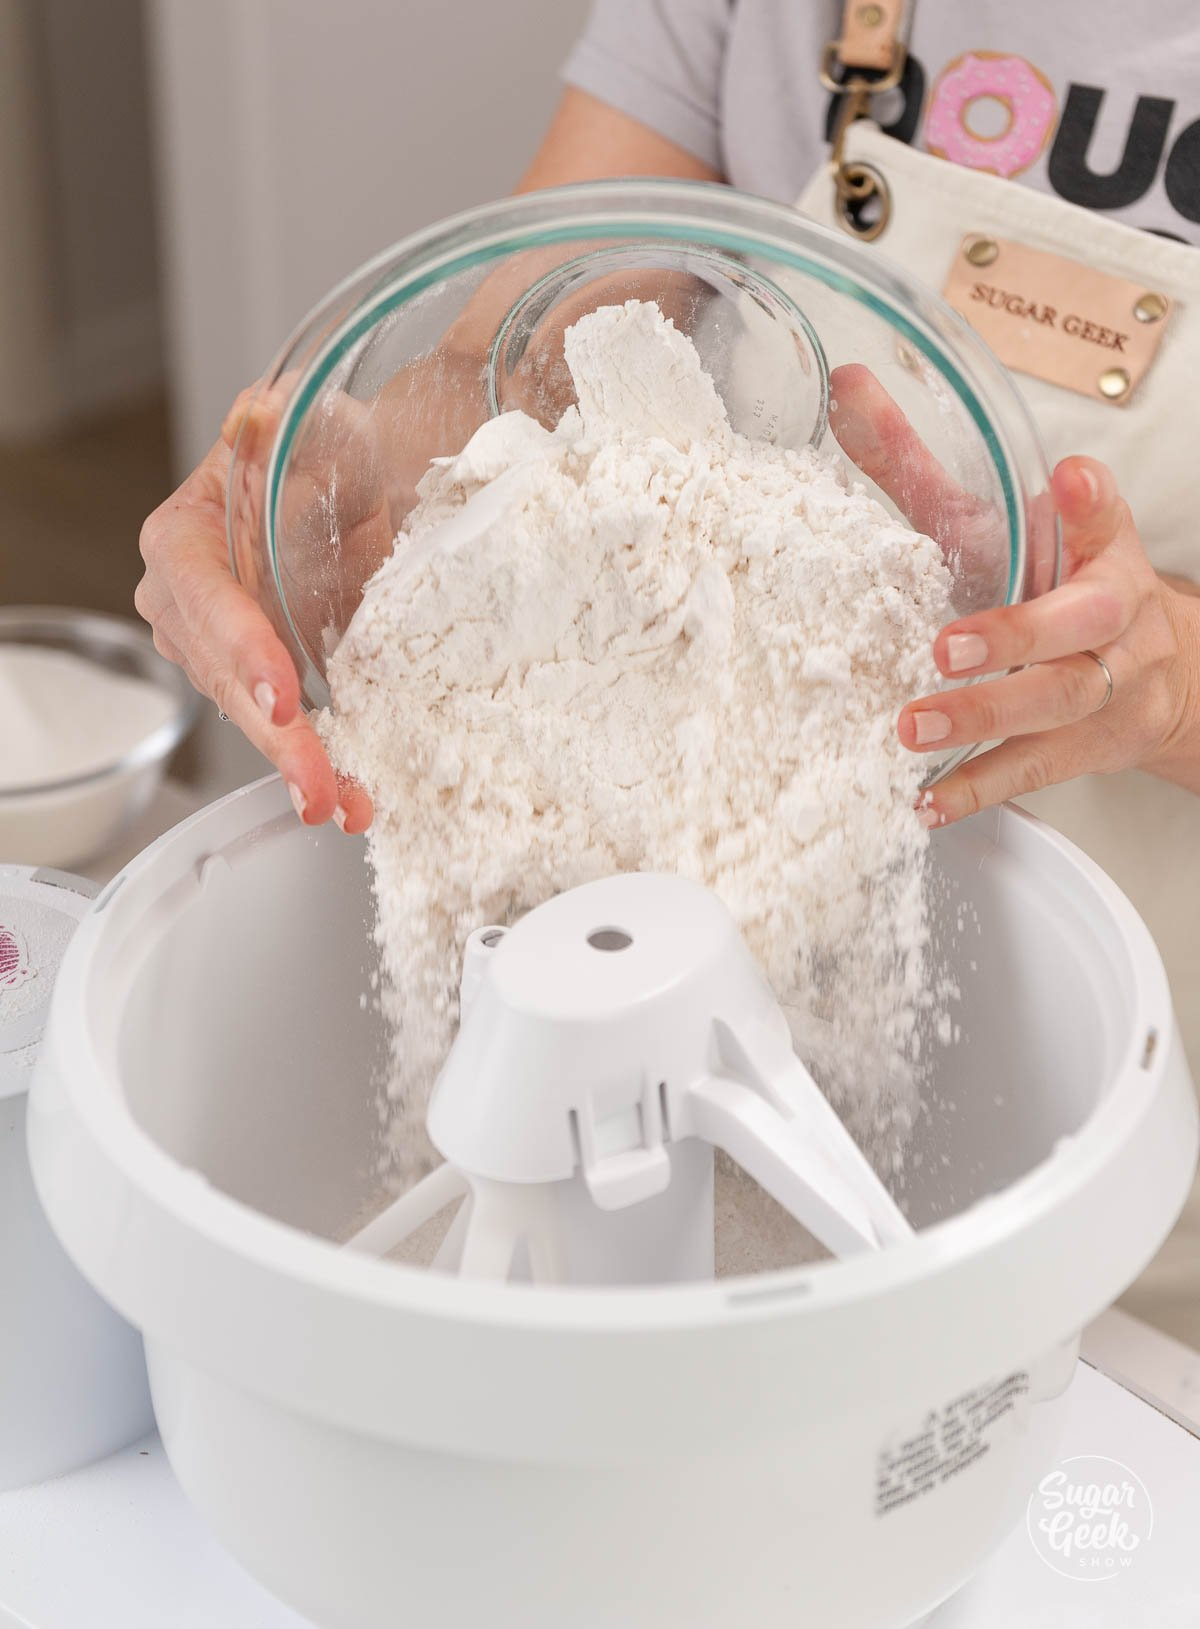 bowl pouring flour into a stand mixer mixing bowl